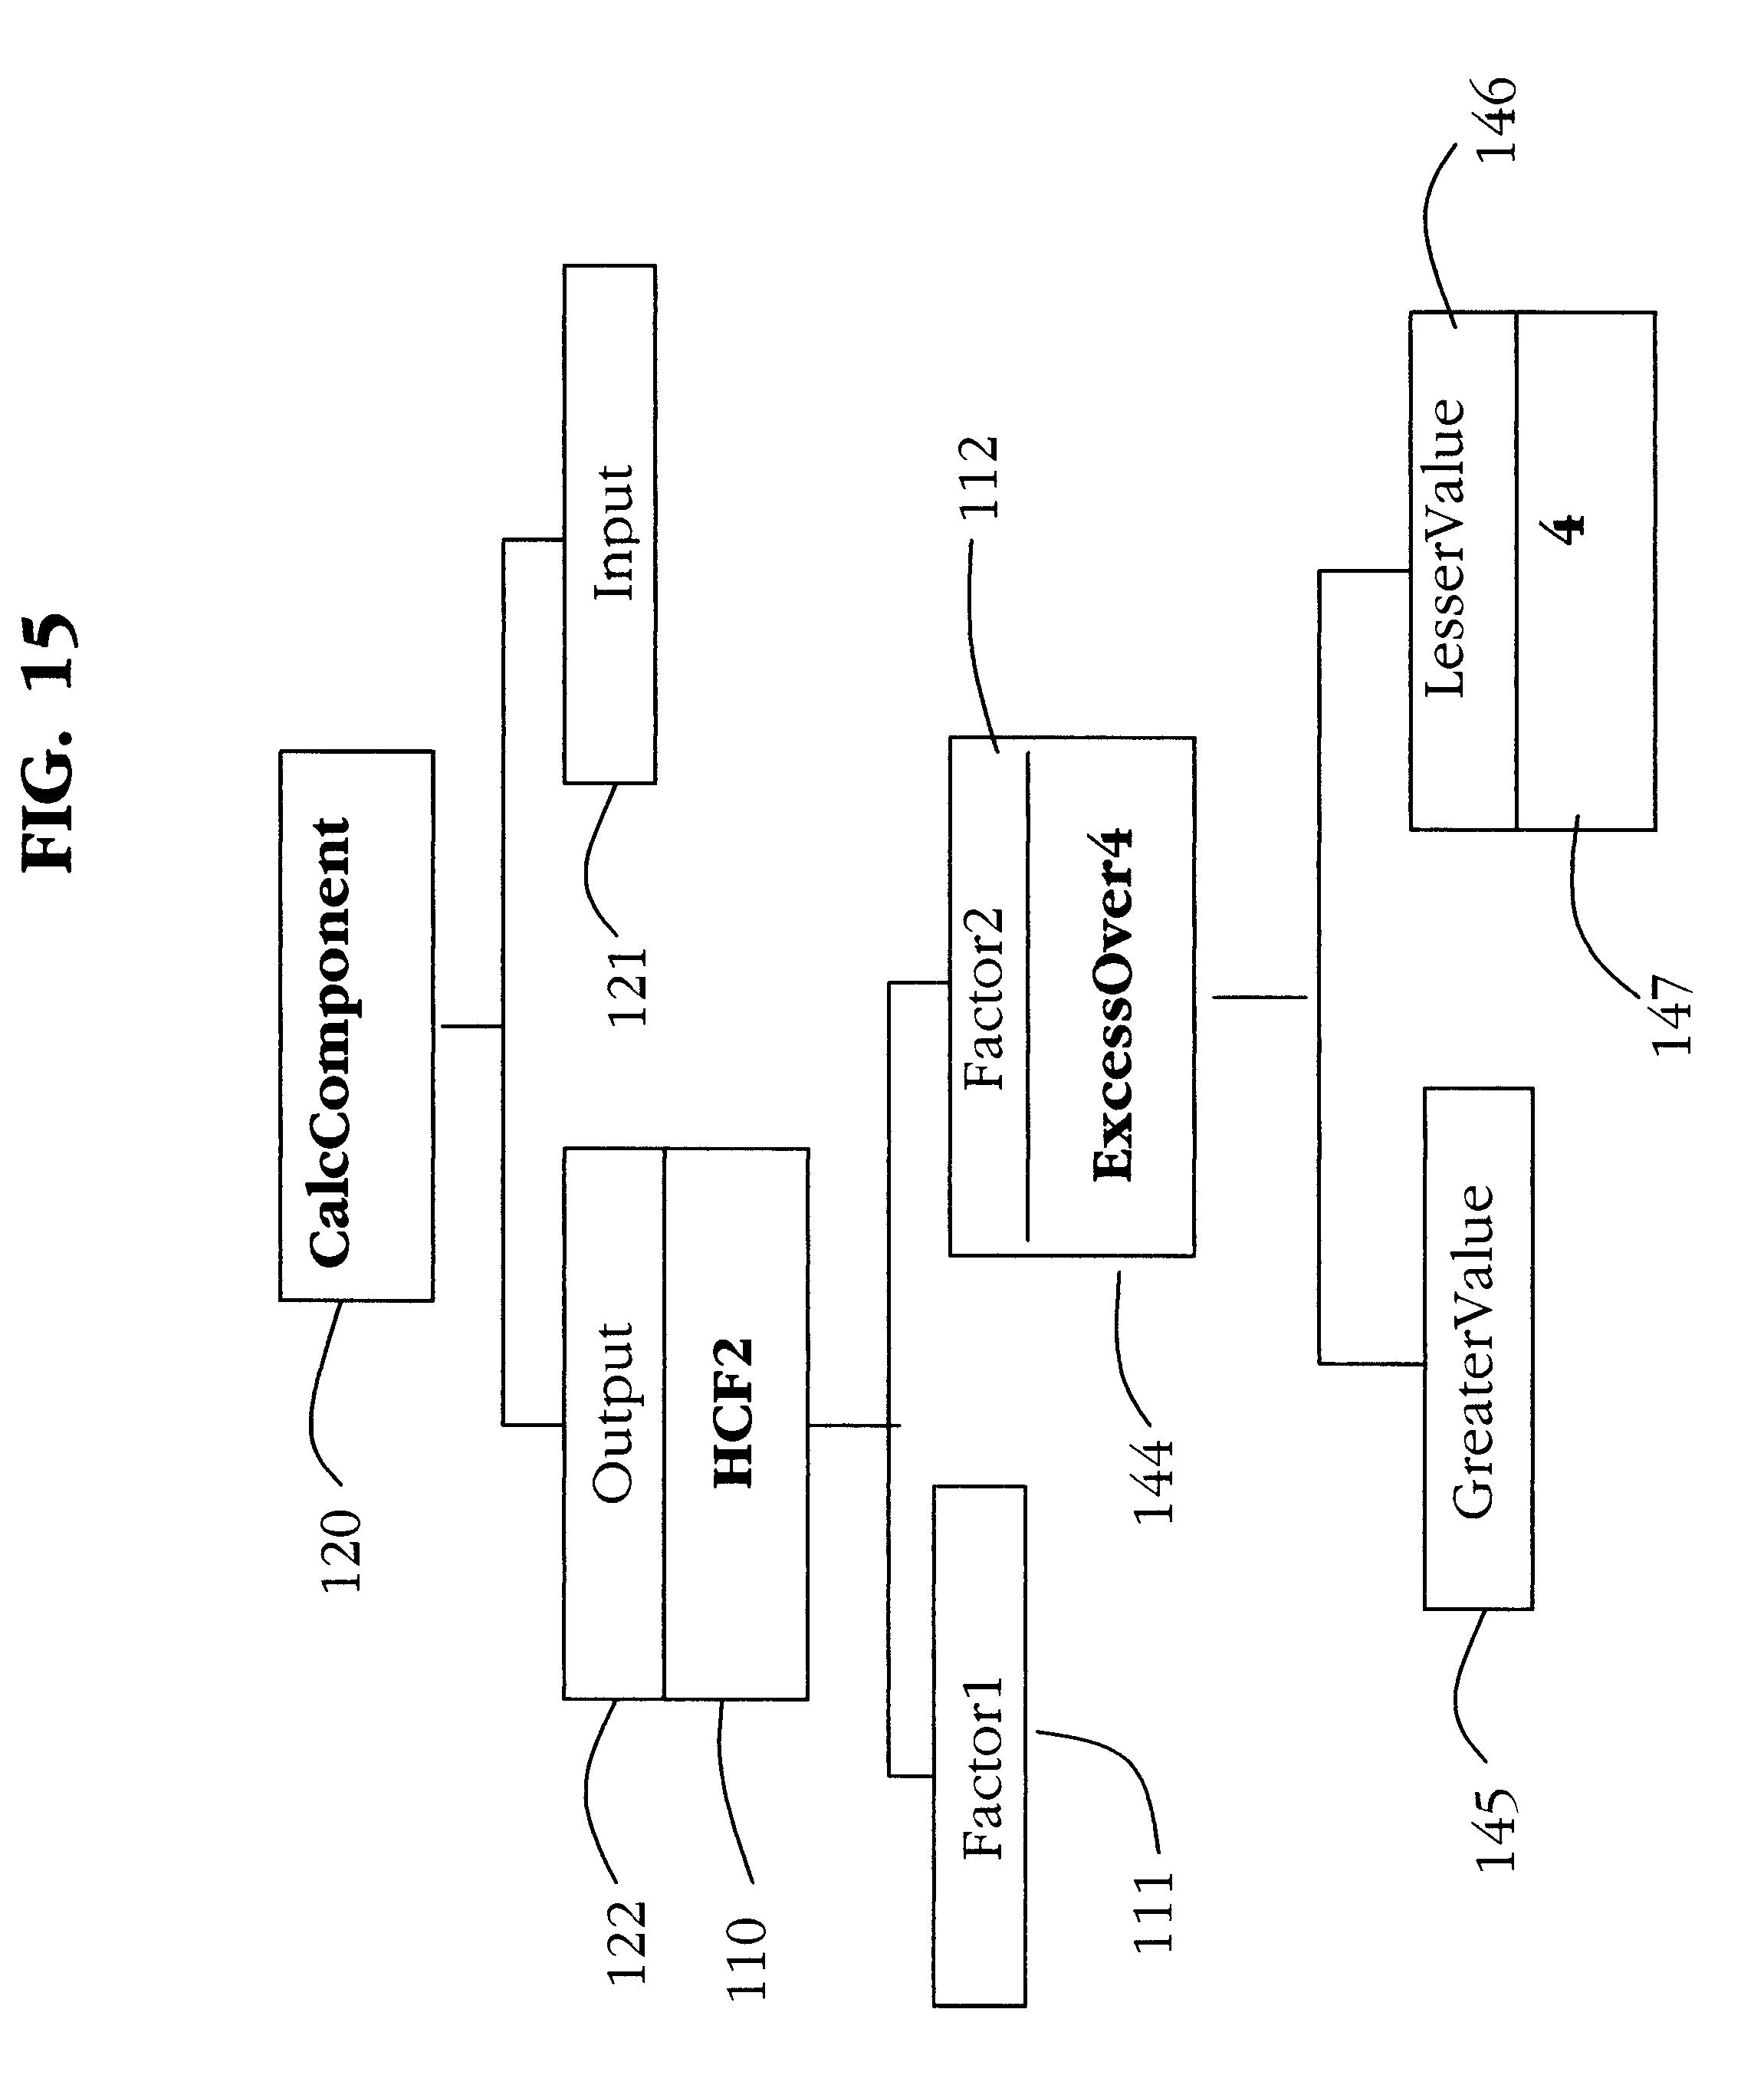 Patent US 6,490,719 B1